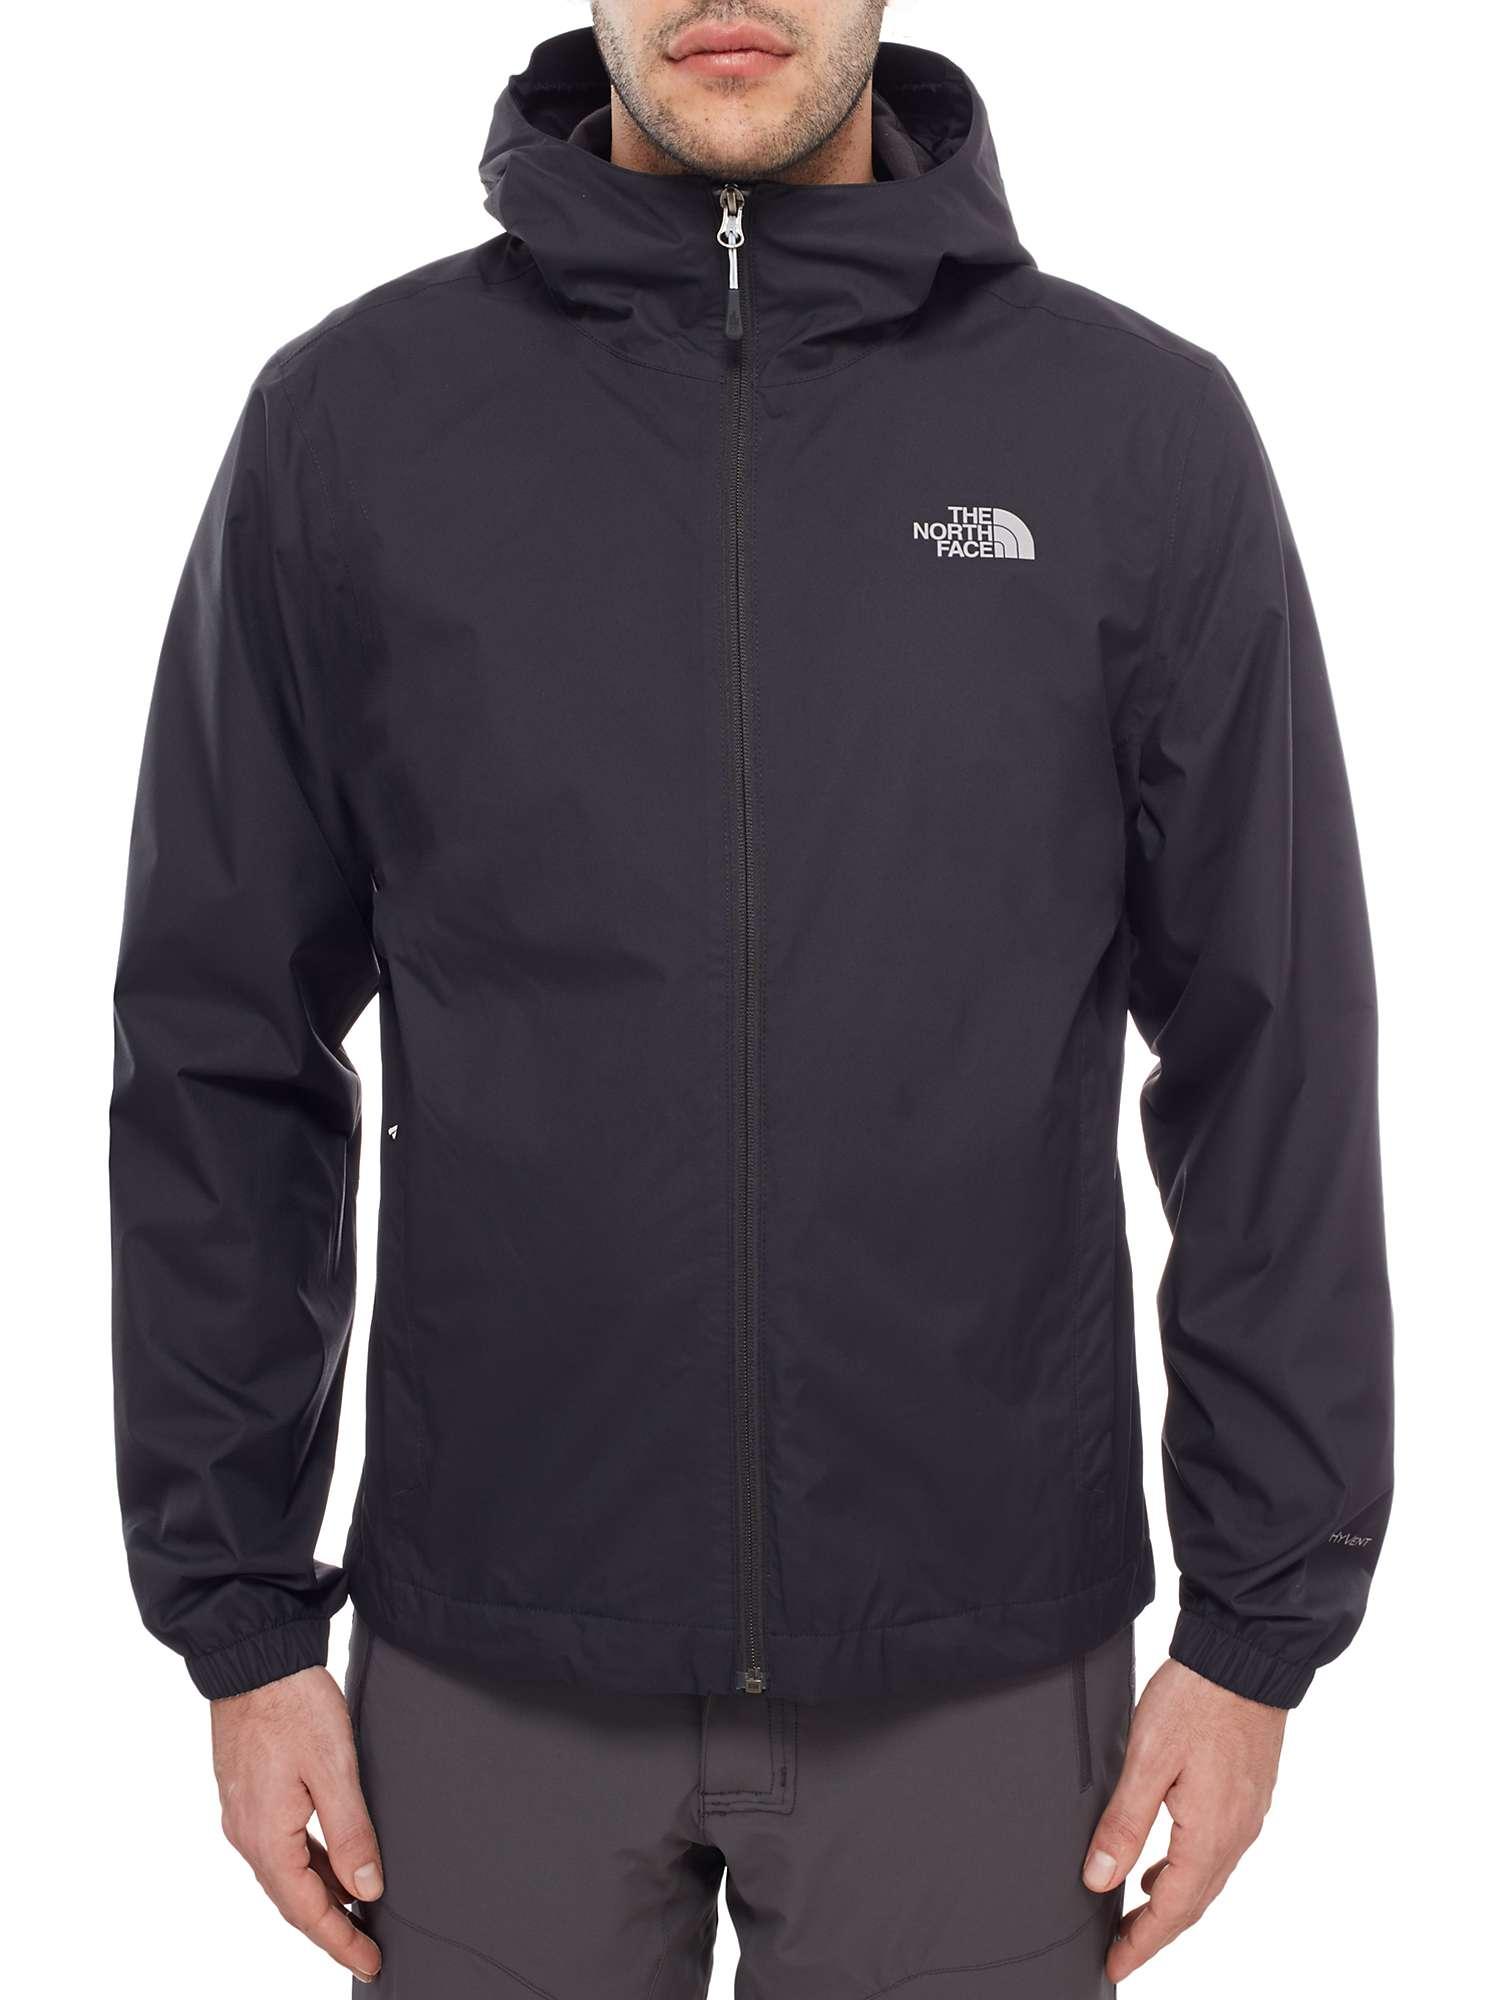 The North Face Quest Waterproof Men's Jacket, Black by John Lewis